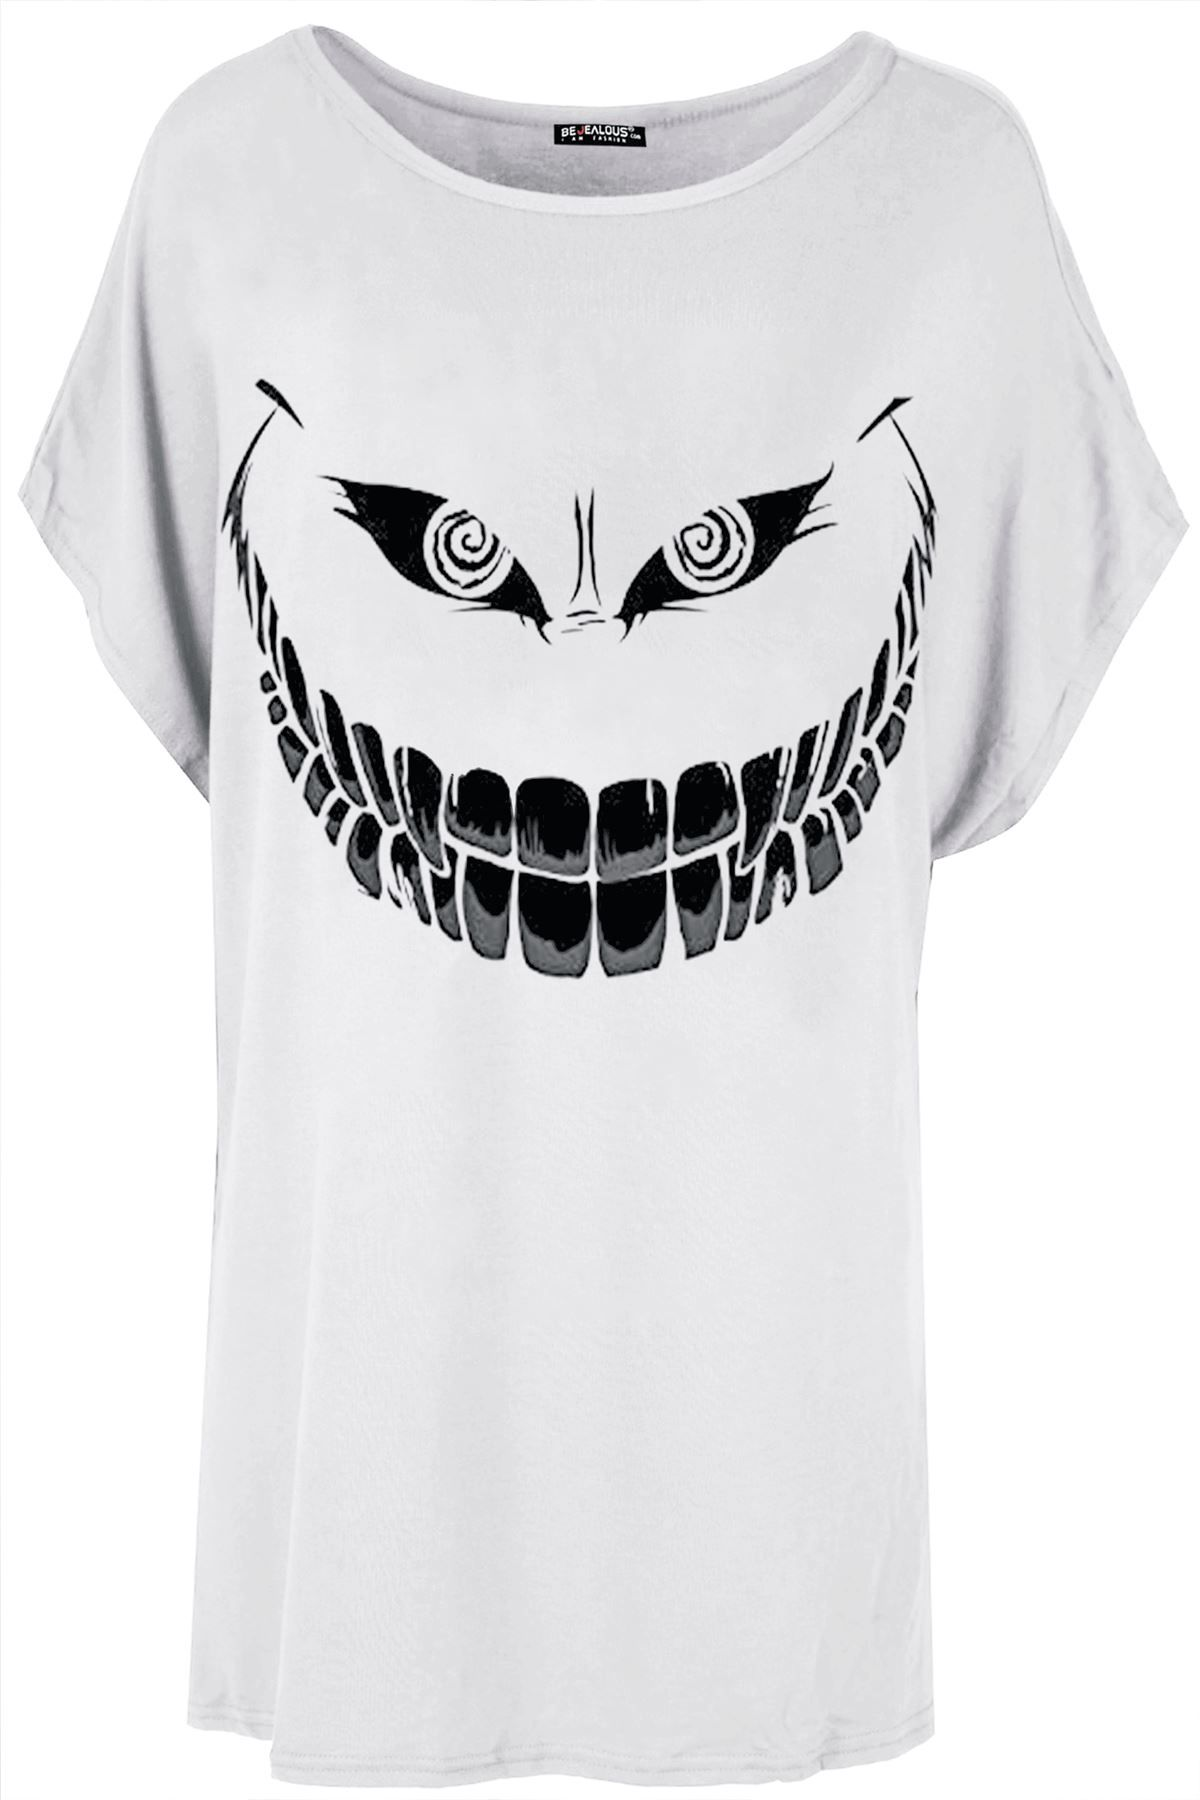 New Ladies Womens Batman Oversized Loose Lagenlook Baggy Sleeve Top Tee T Shirt